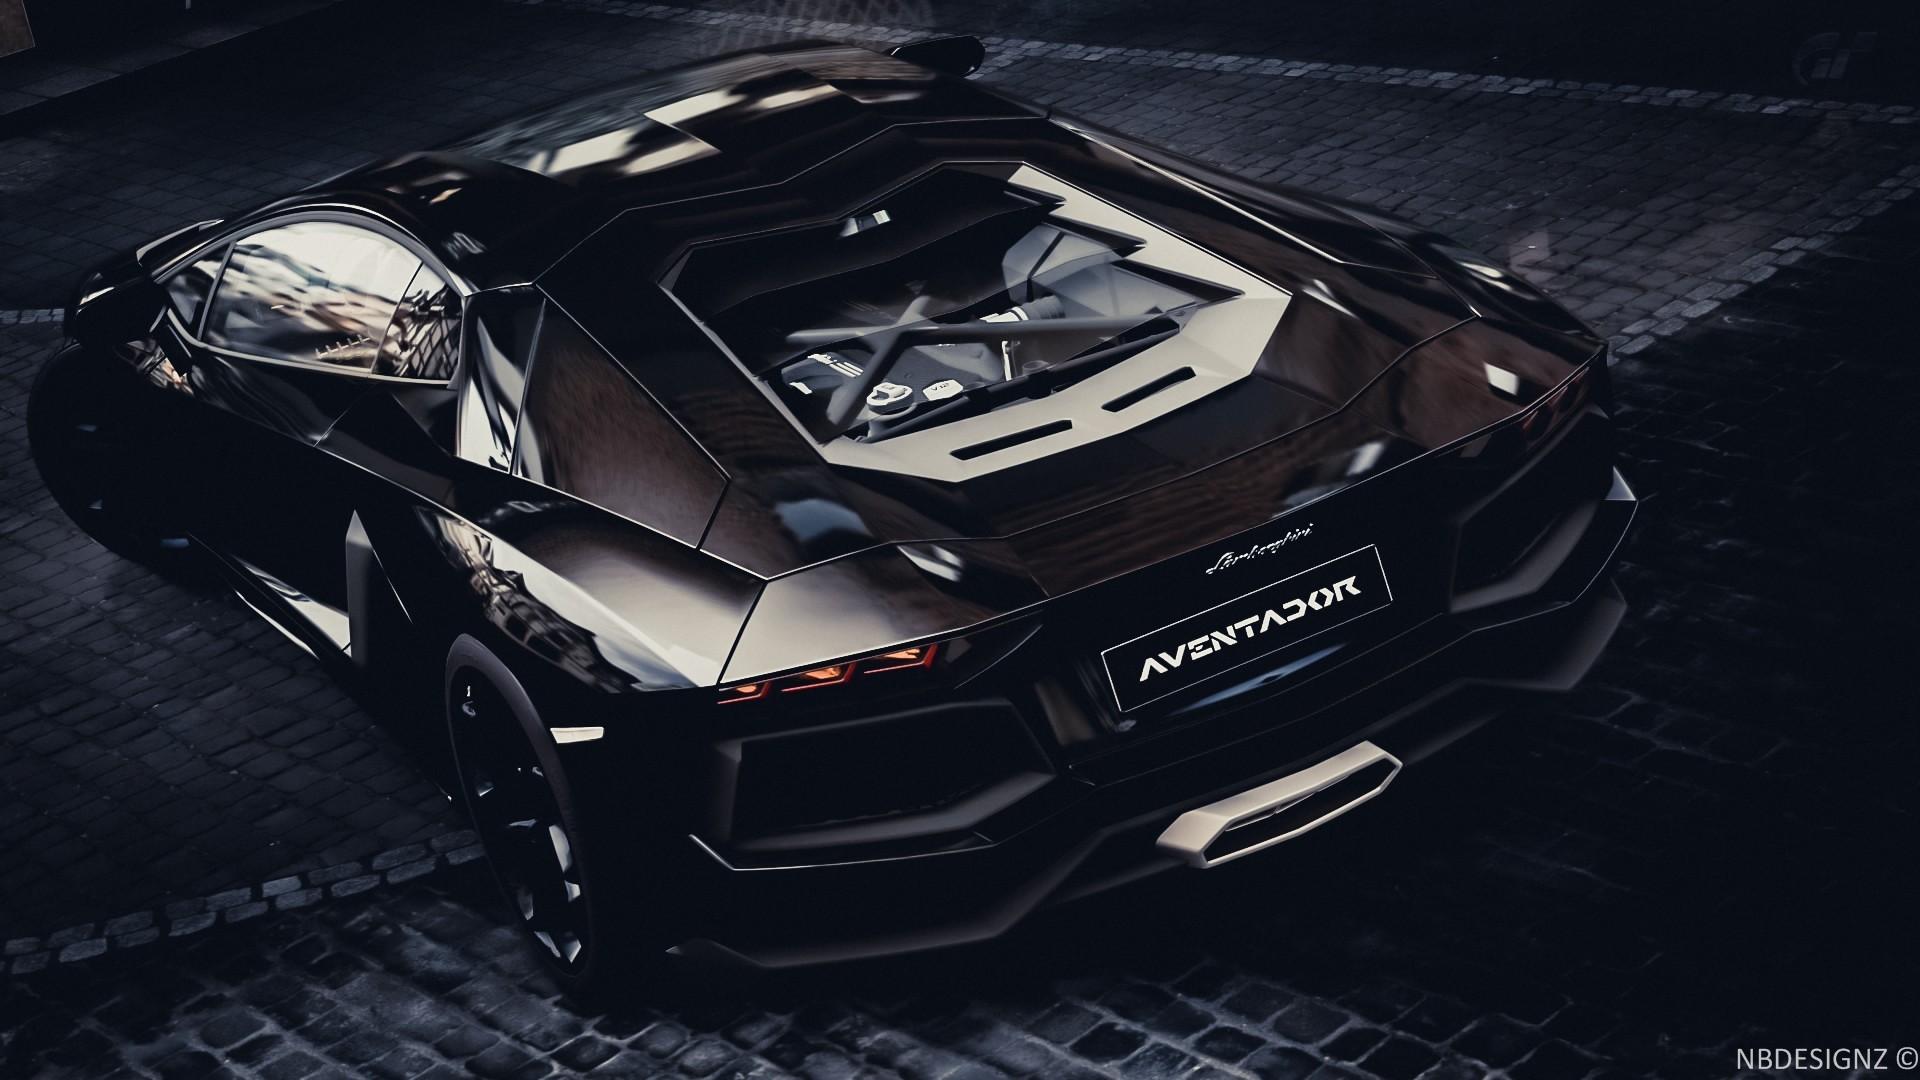 Lamborghini Aventador, Carbon Fiber, Car, Lamborghini Wallpapers HD /  Desktop and Mobile Backgrounds